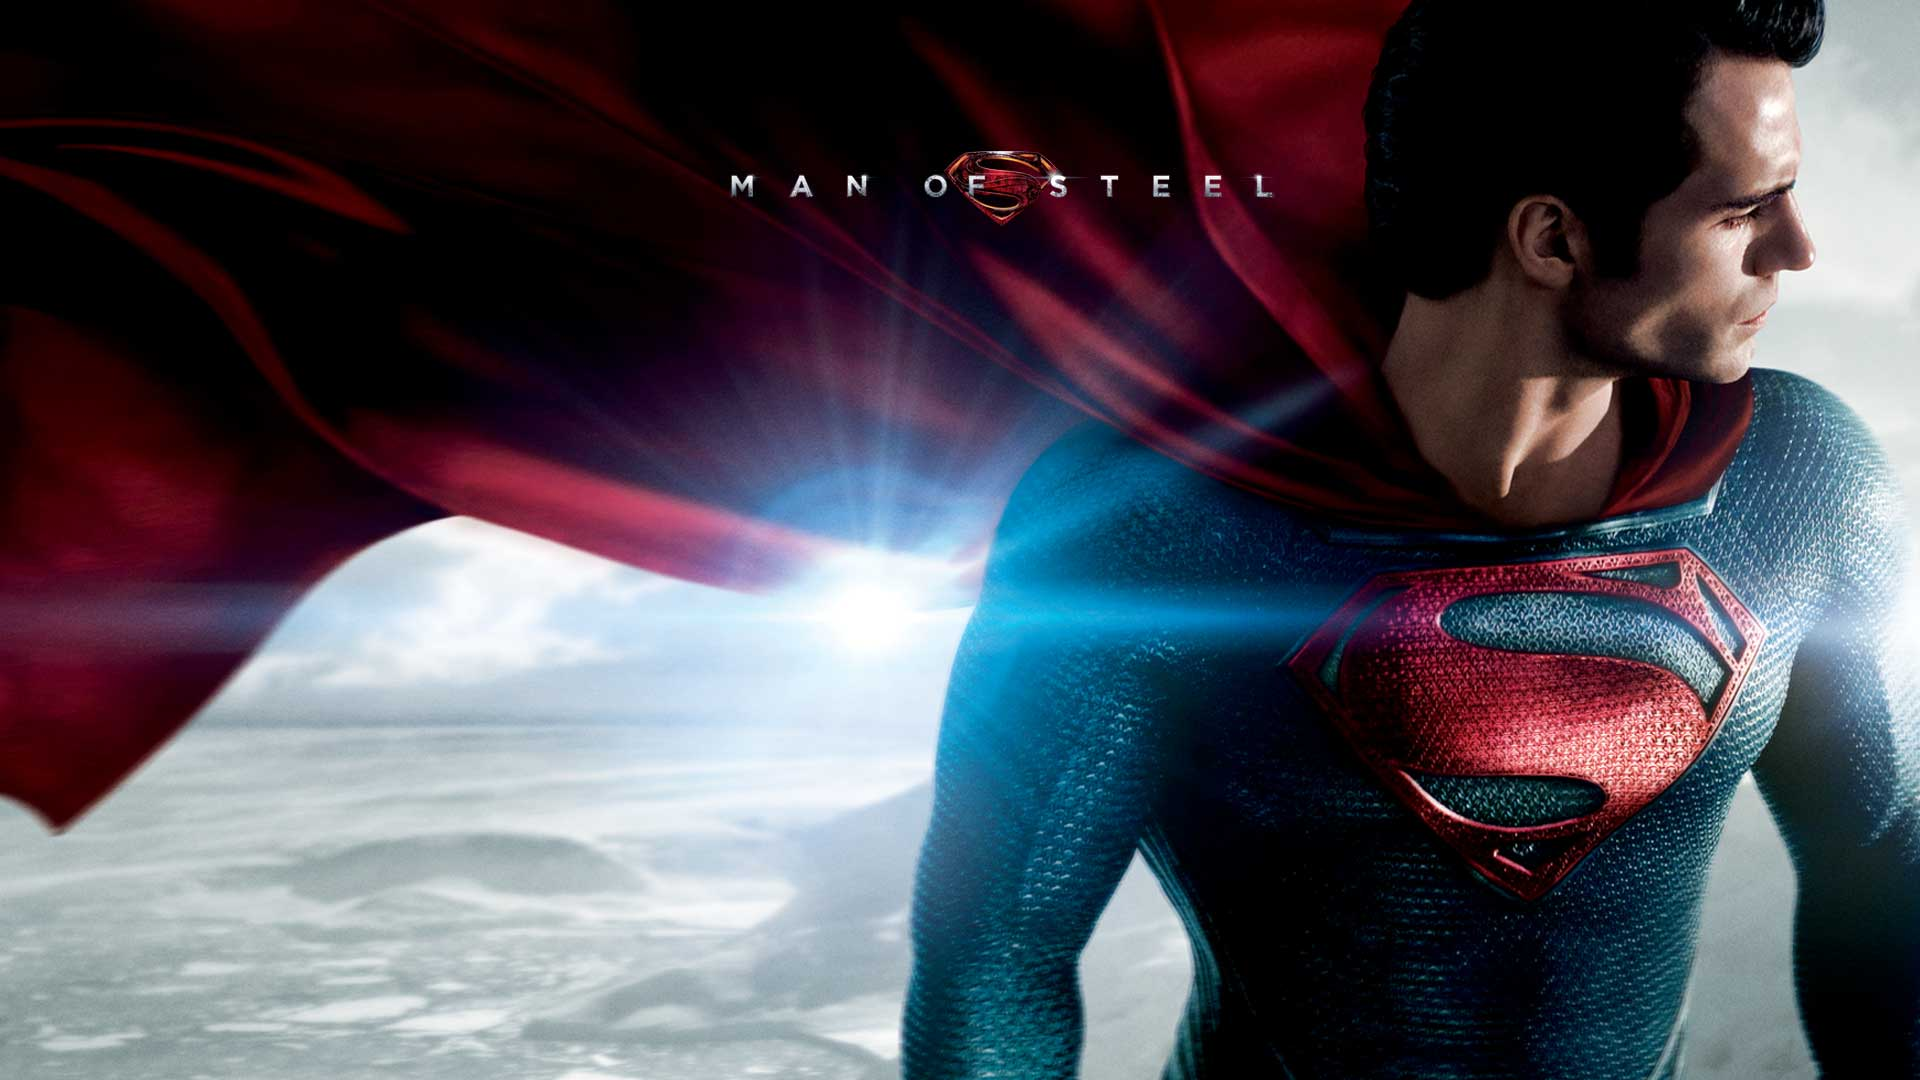 Celebrating Man of Steel: A Great Modern Day Superman Origin